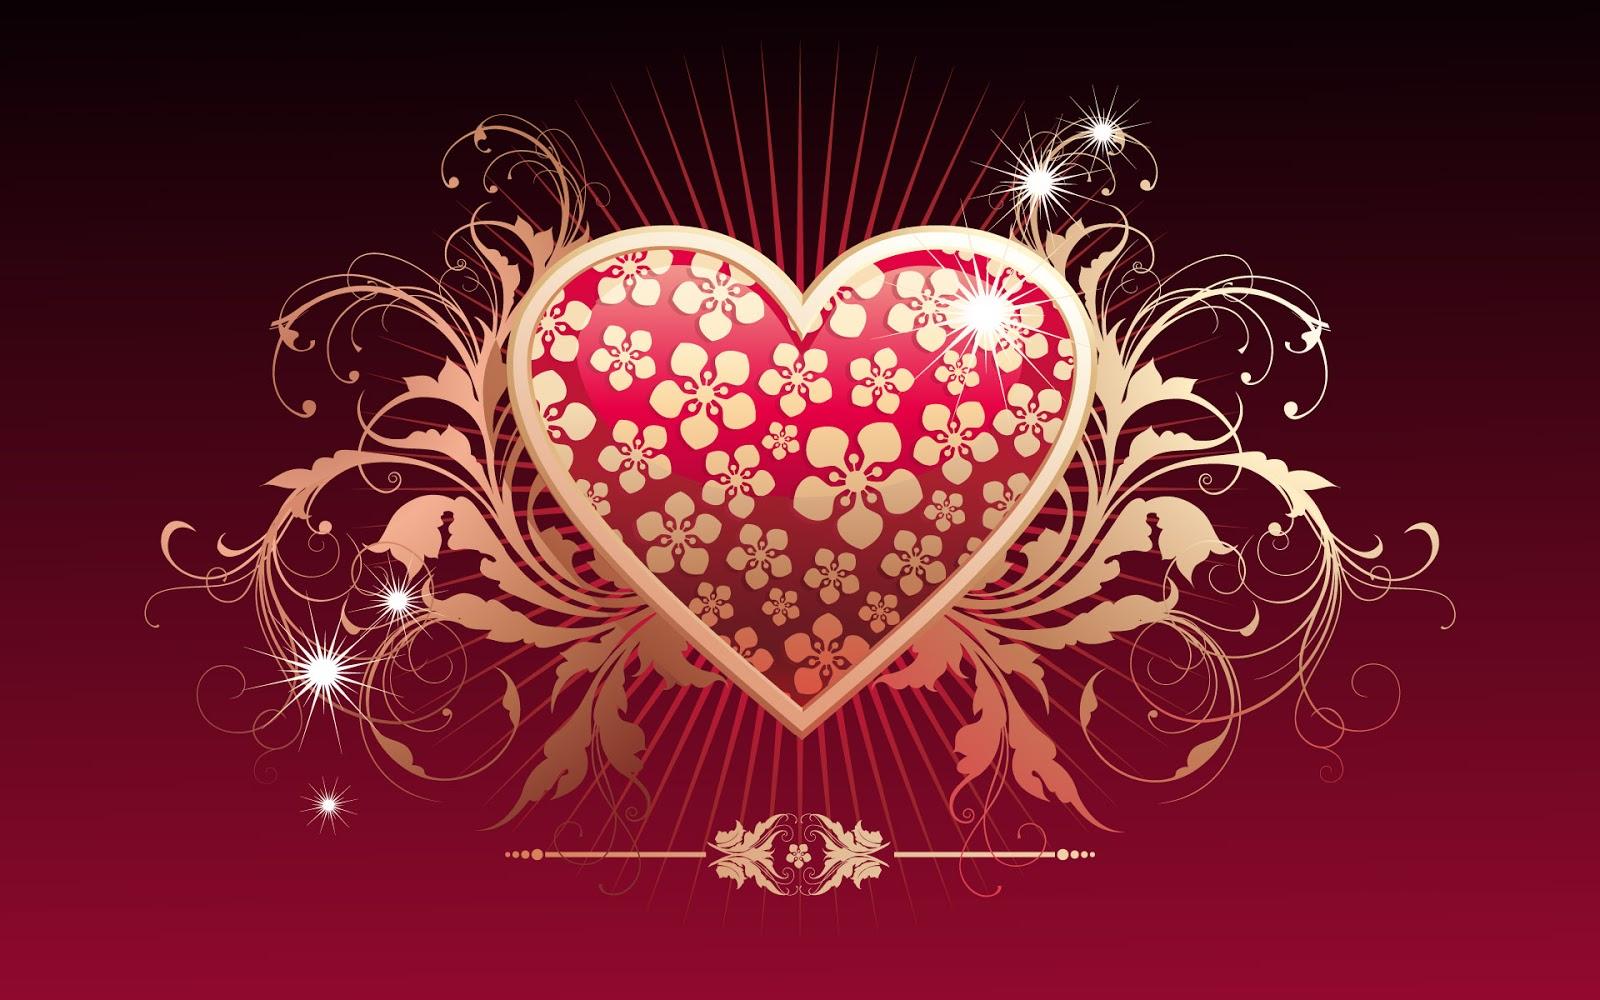 http://1.bp.blogspot.com/-EpKhU3AZoDU/UQ-Xf1rFJGI/AAAAAAAADcw/I3VmVDK8kmE/s1600/valentines+day+hd+wallpapers.jpg